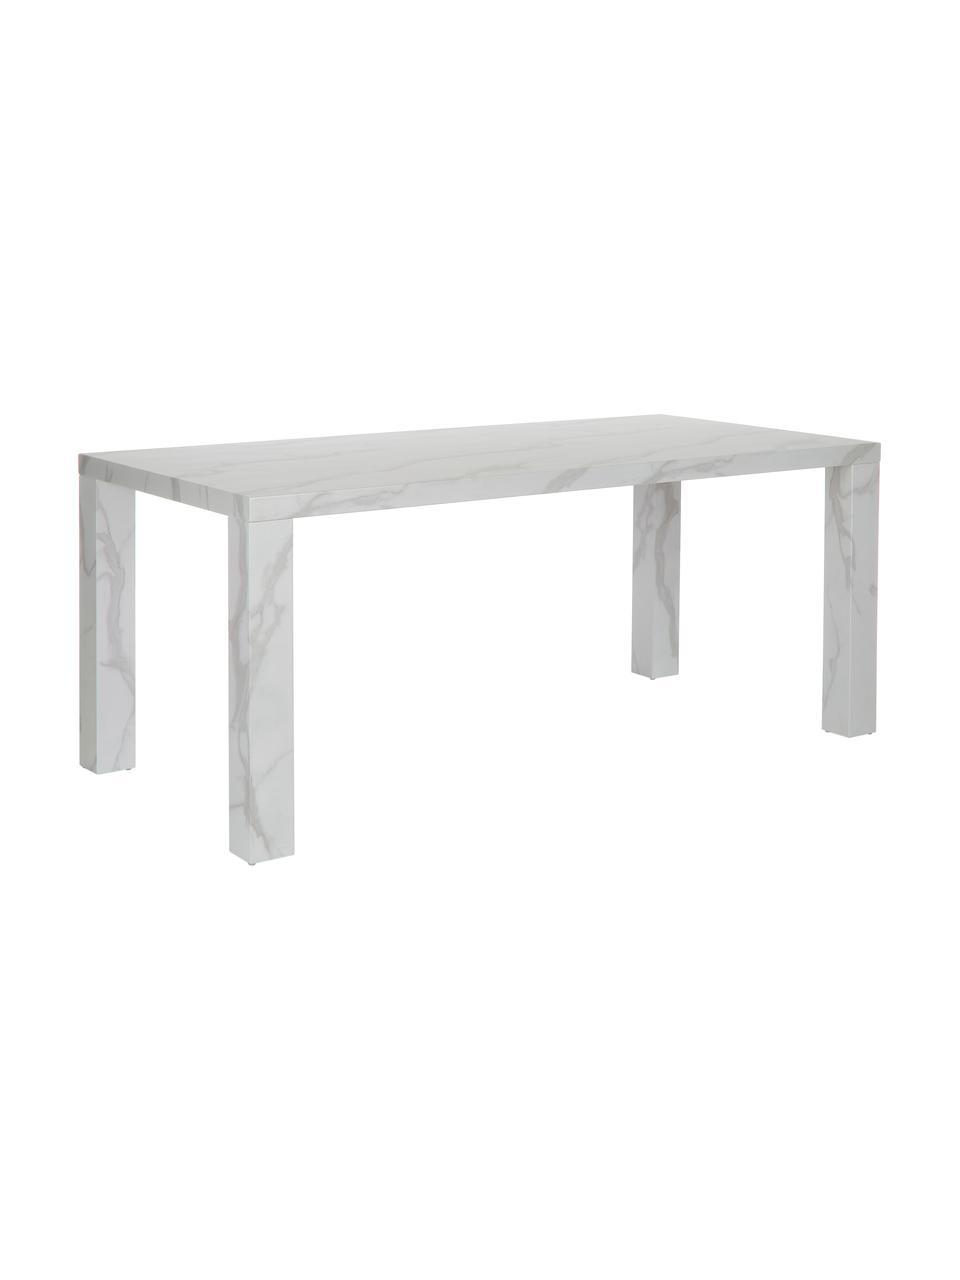 Table blanche aspect marbre Carl, 180 x 90 cm, Blanc marbré, brillant